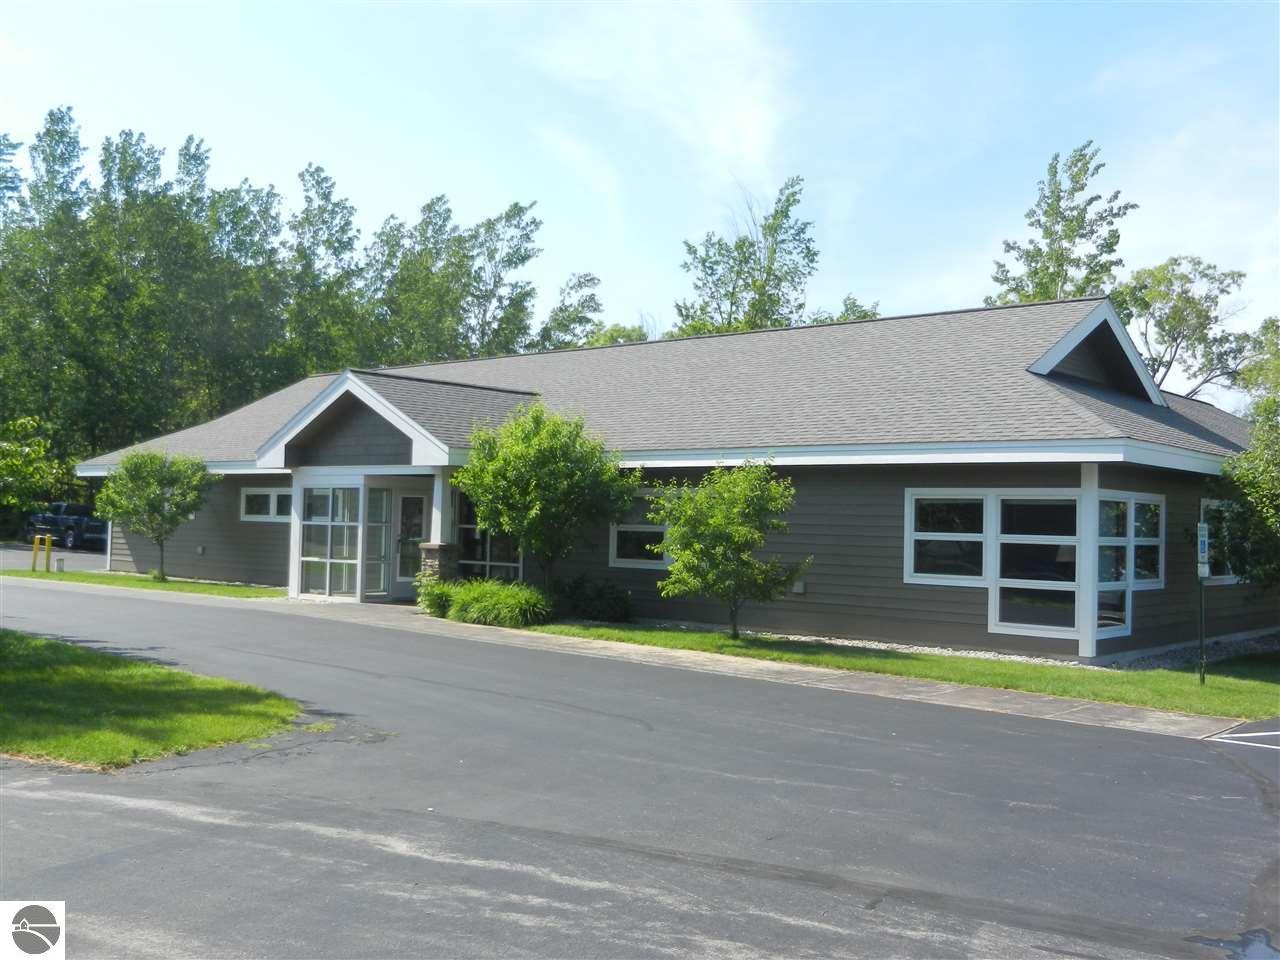 Michigan leelanau county northport 49670 - Property For Sale At 10126 E Cherry Bend Road Traverse City Mi 49684